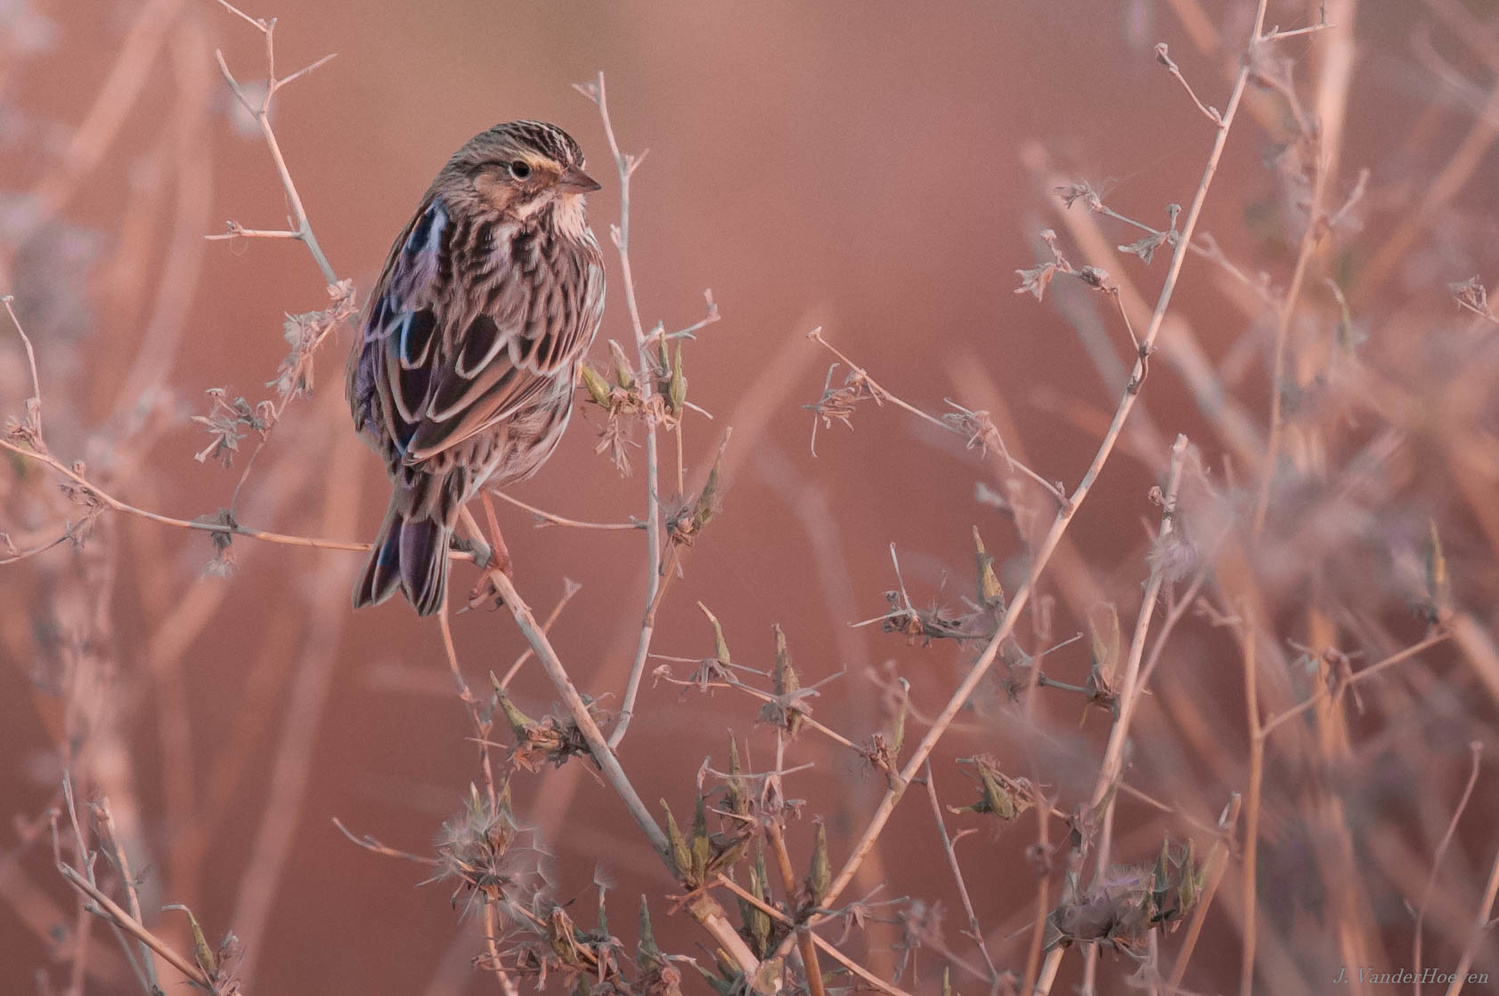 Morning Sparrow by Jake VanderHoeven